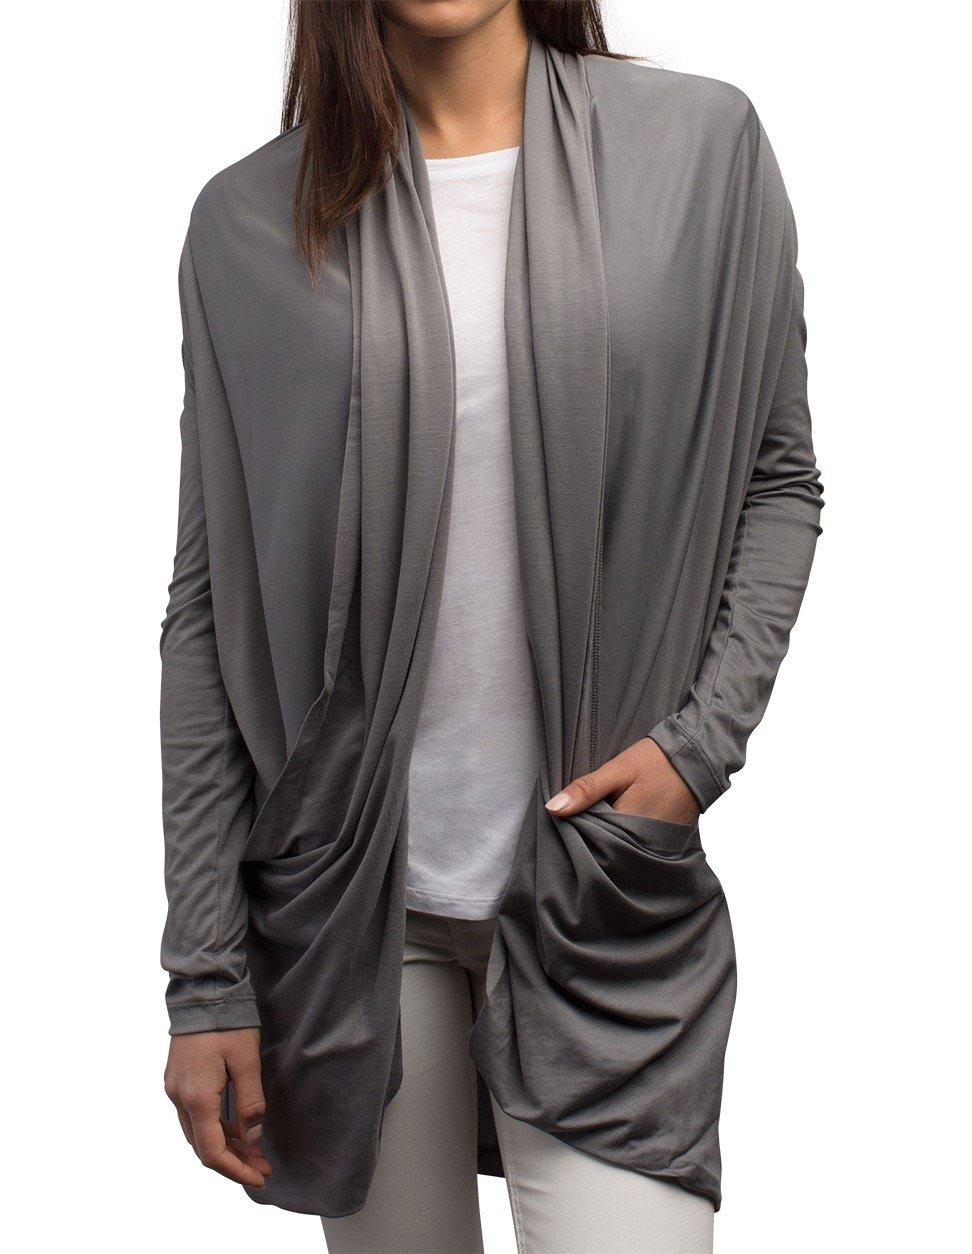 SCOTTeVEST Madeline Cardigan - 4 Pockets - Travel Clothing, Sweater GRY S